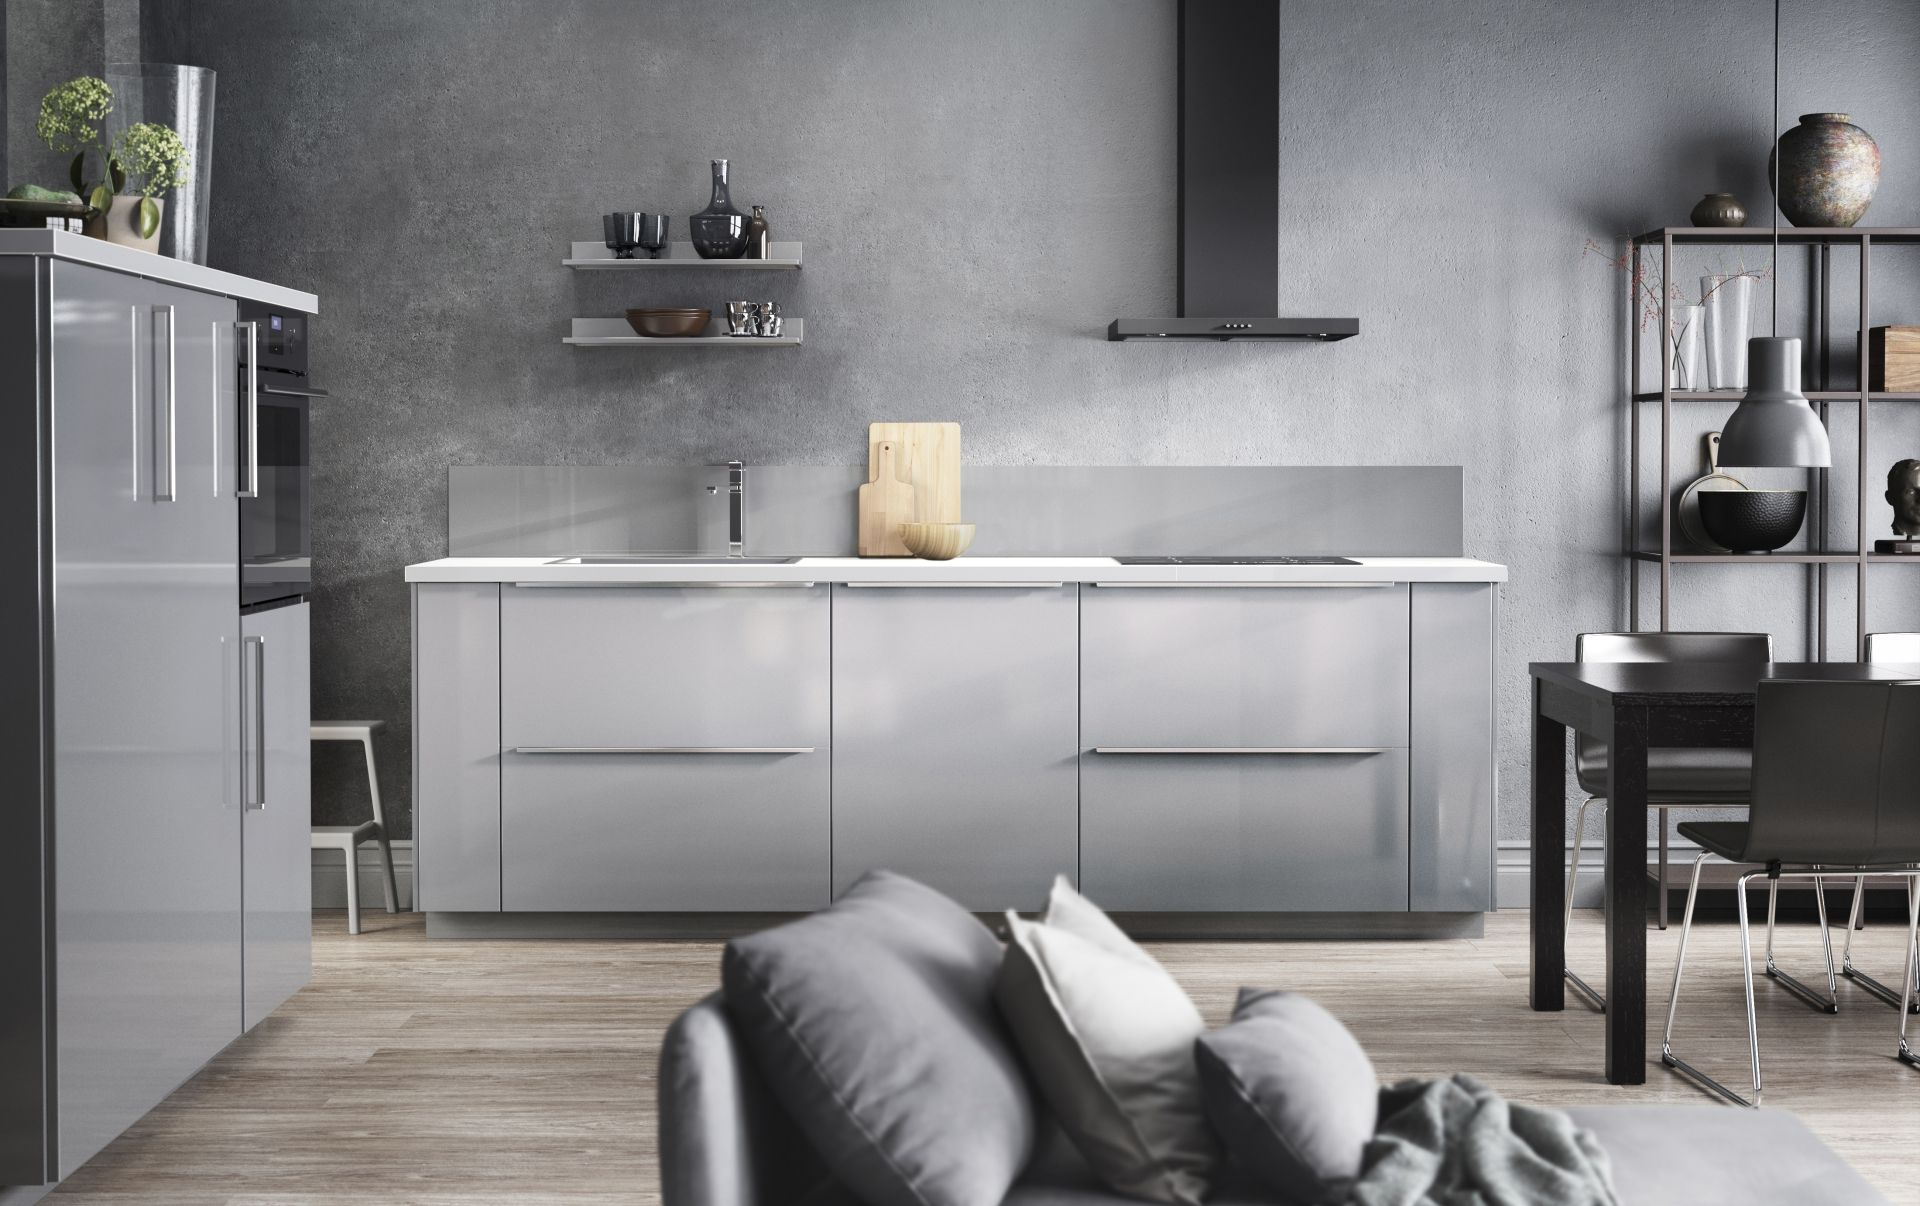 Keuken Interieur Scandinavisch : Metod keuken in elegant grijs ikea ikeanl keukens modern